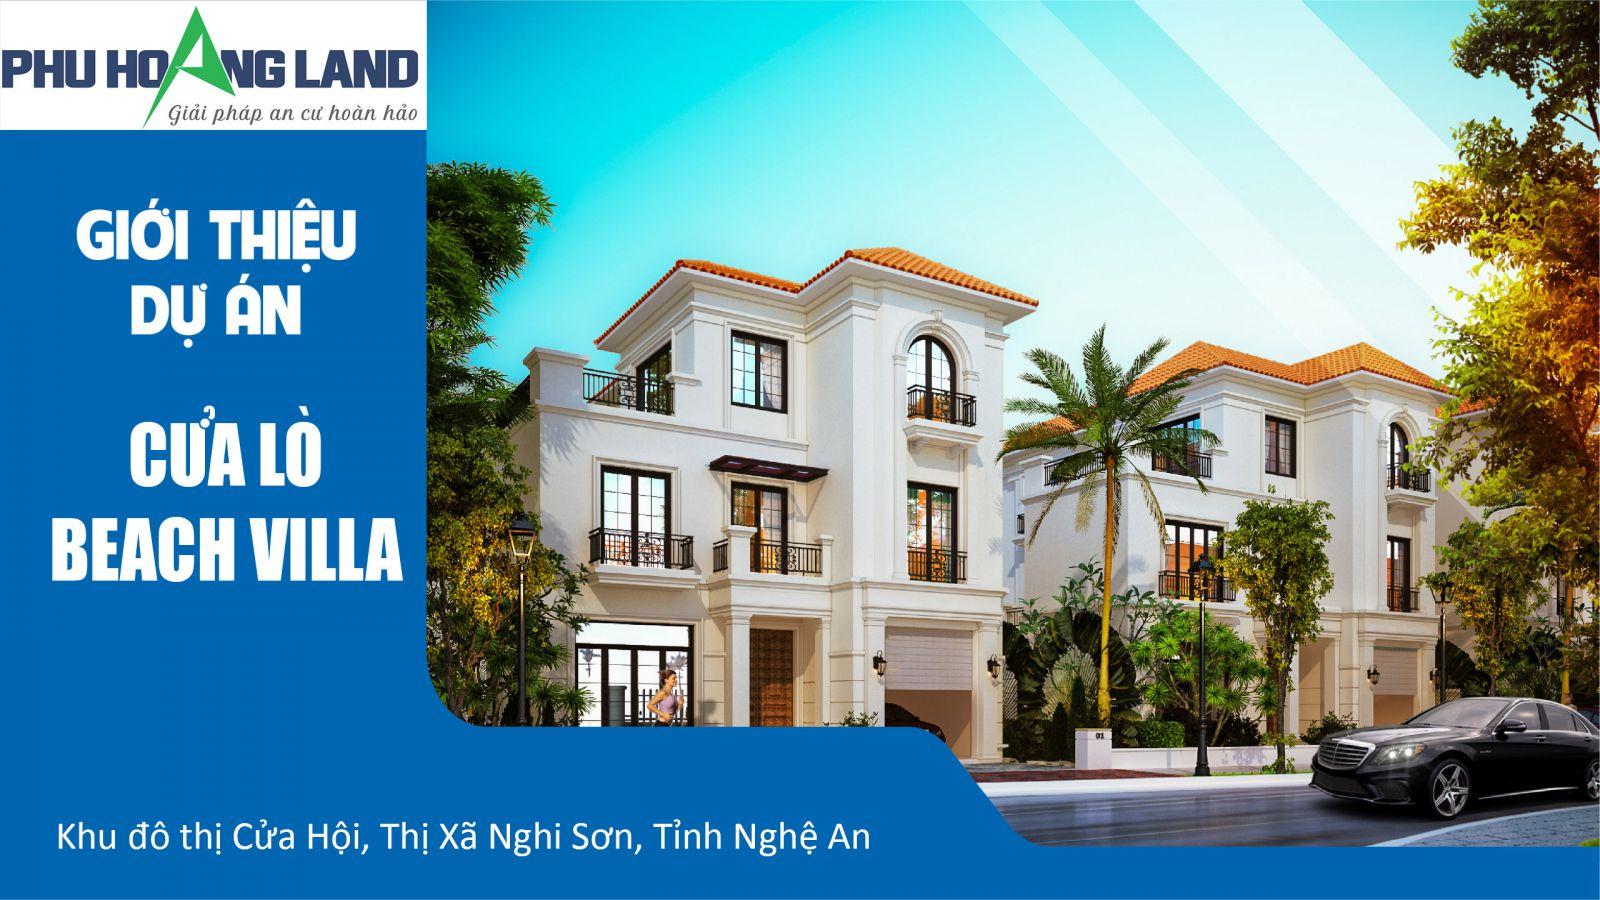 Phối cảnh biệt thự Cửa Lò Beach Villa